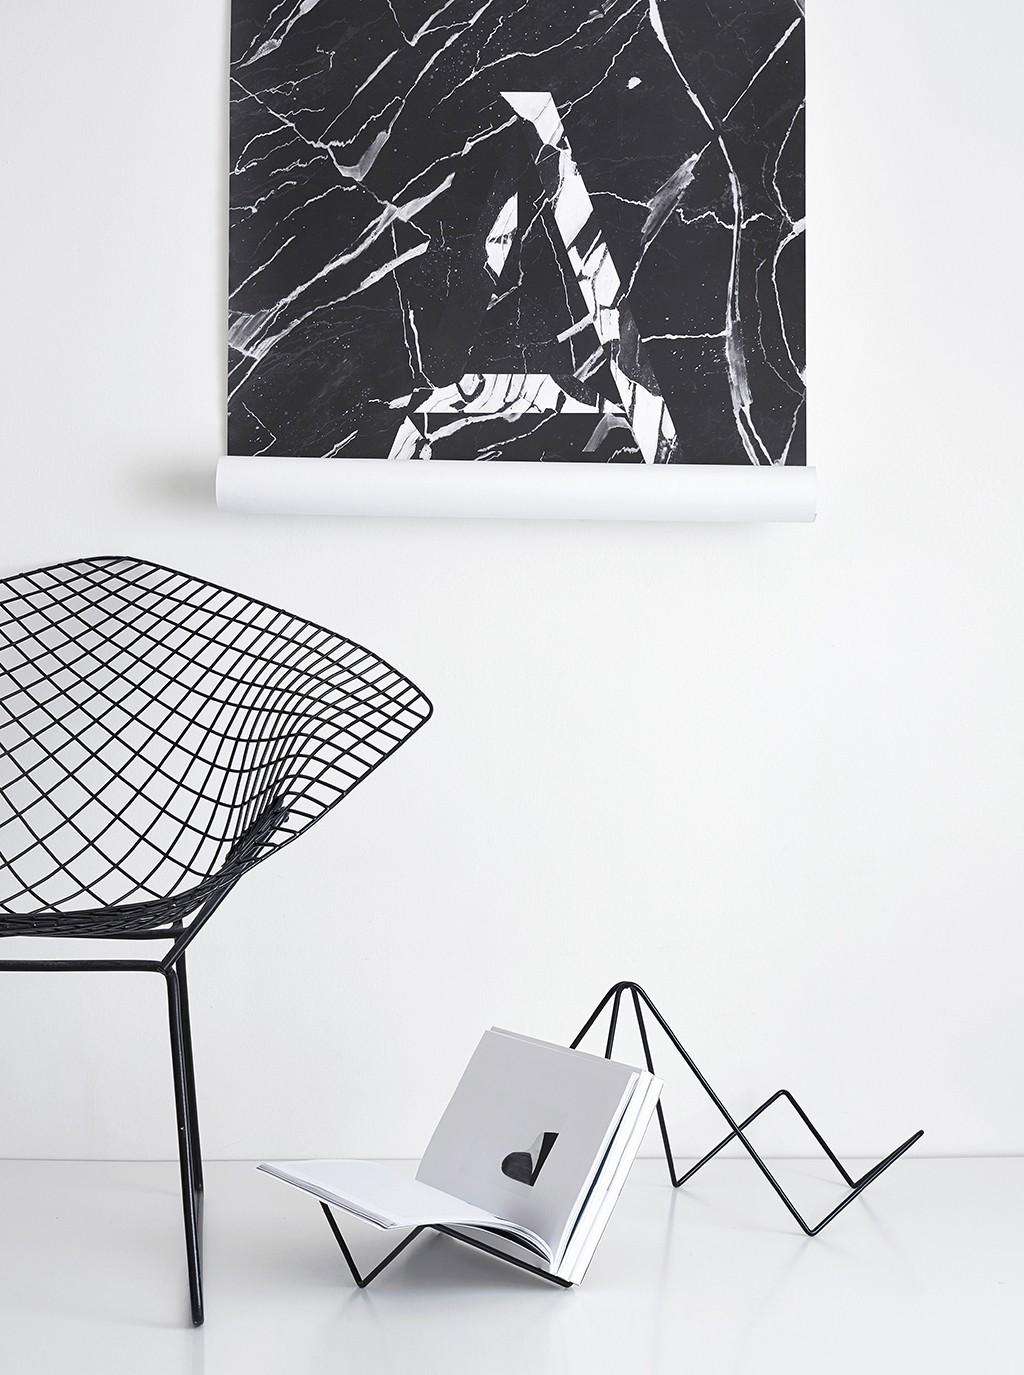 Studio Macura for Studio Macura by Susanna Vento